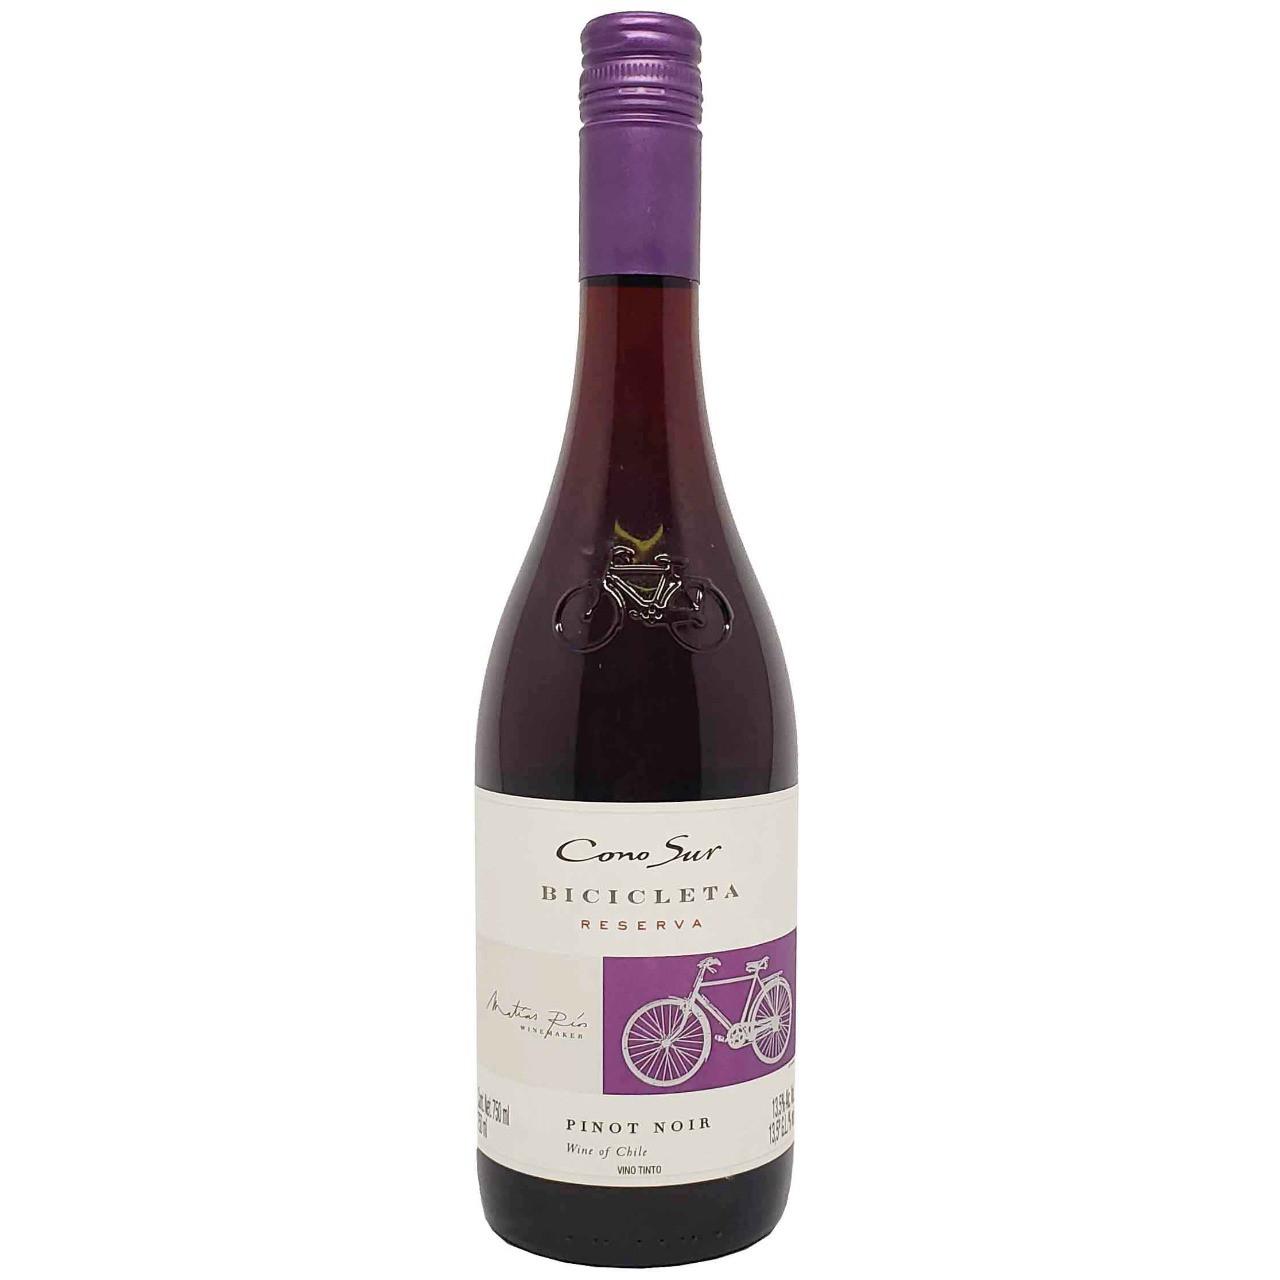 Vinho Tinto Bicicleta Reserva Pinot Noir Cono Sur - 750ml -